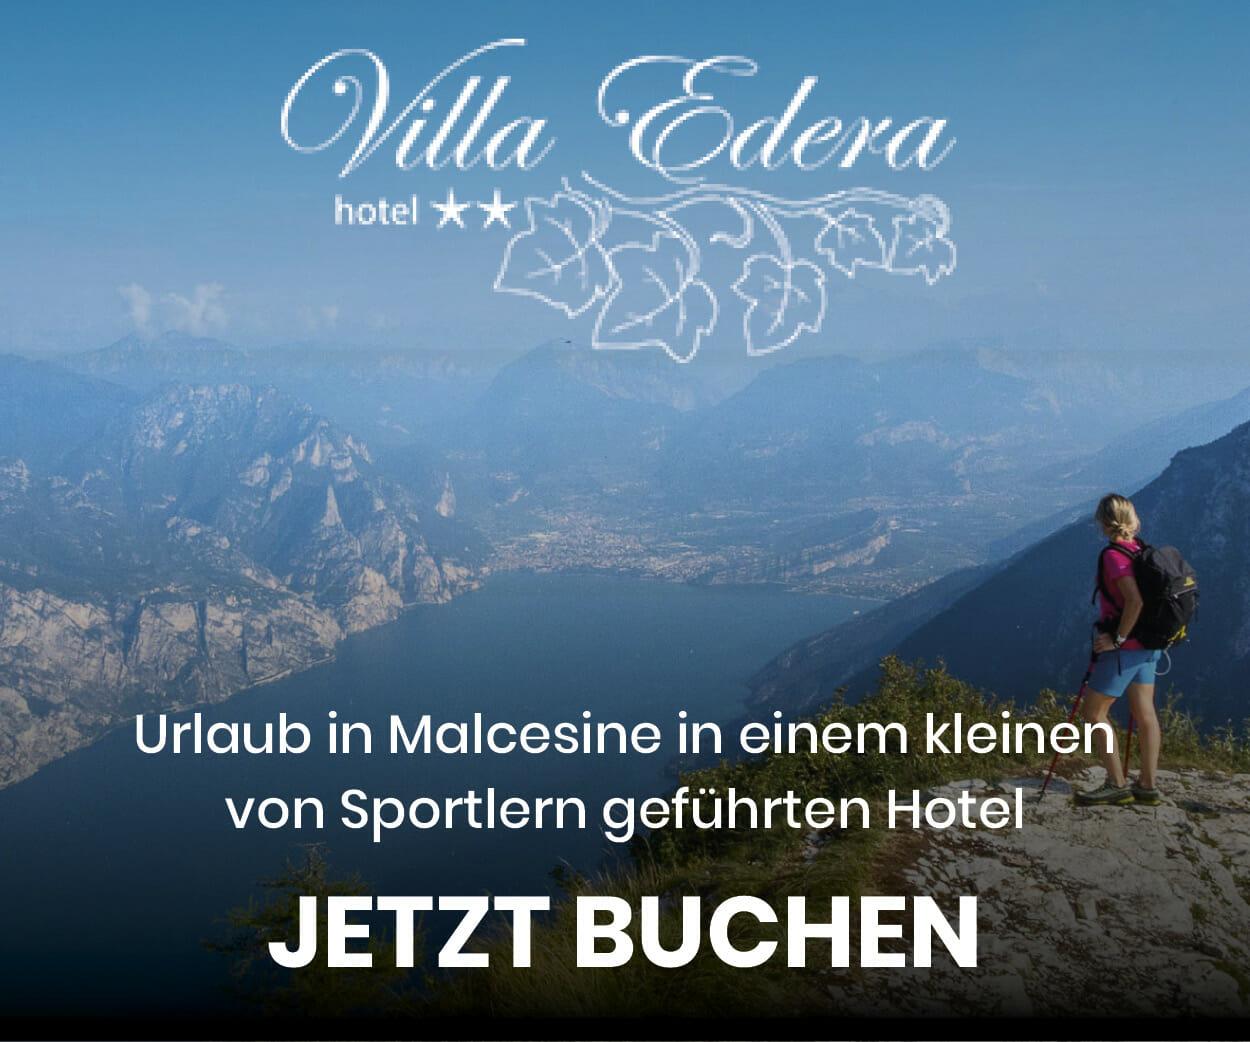 Hotel Villa Edera Malcesine 360gardalife de